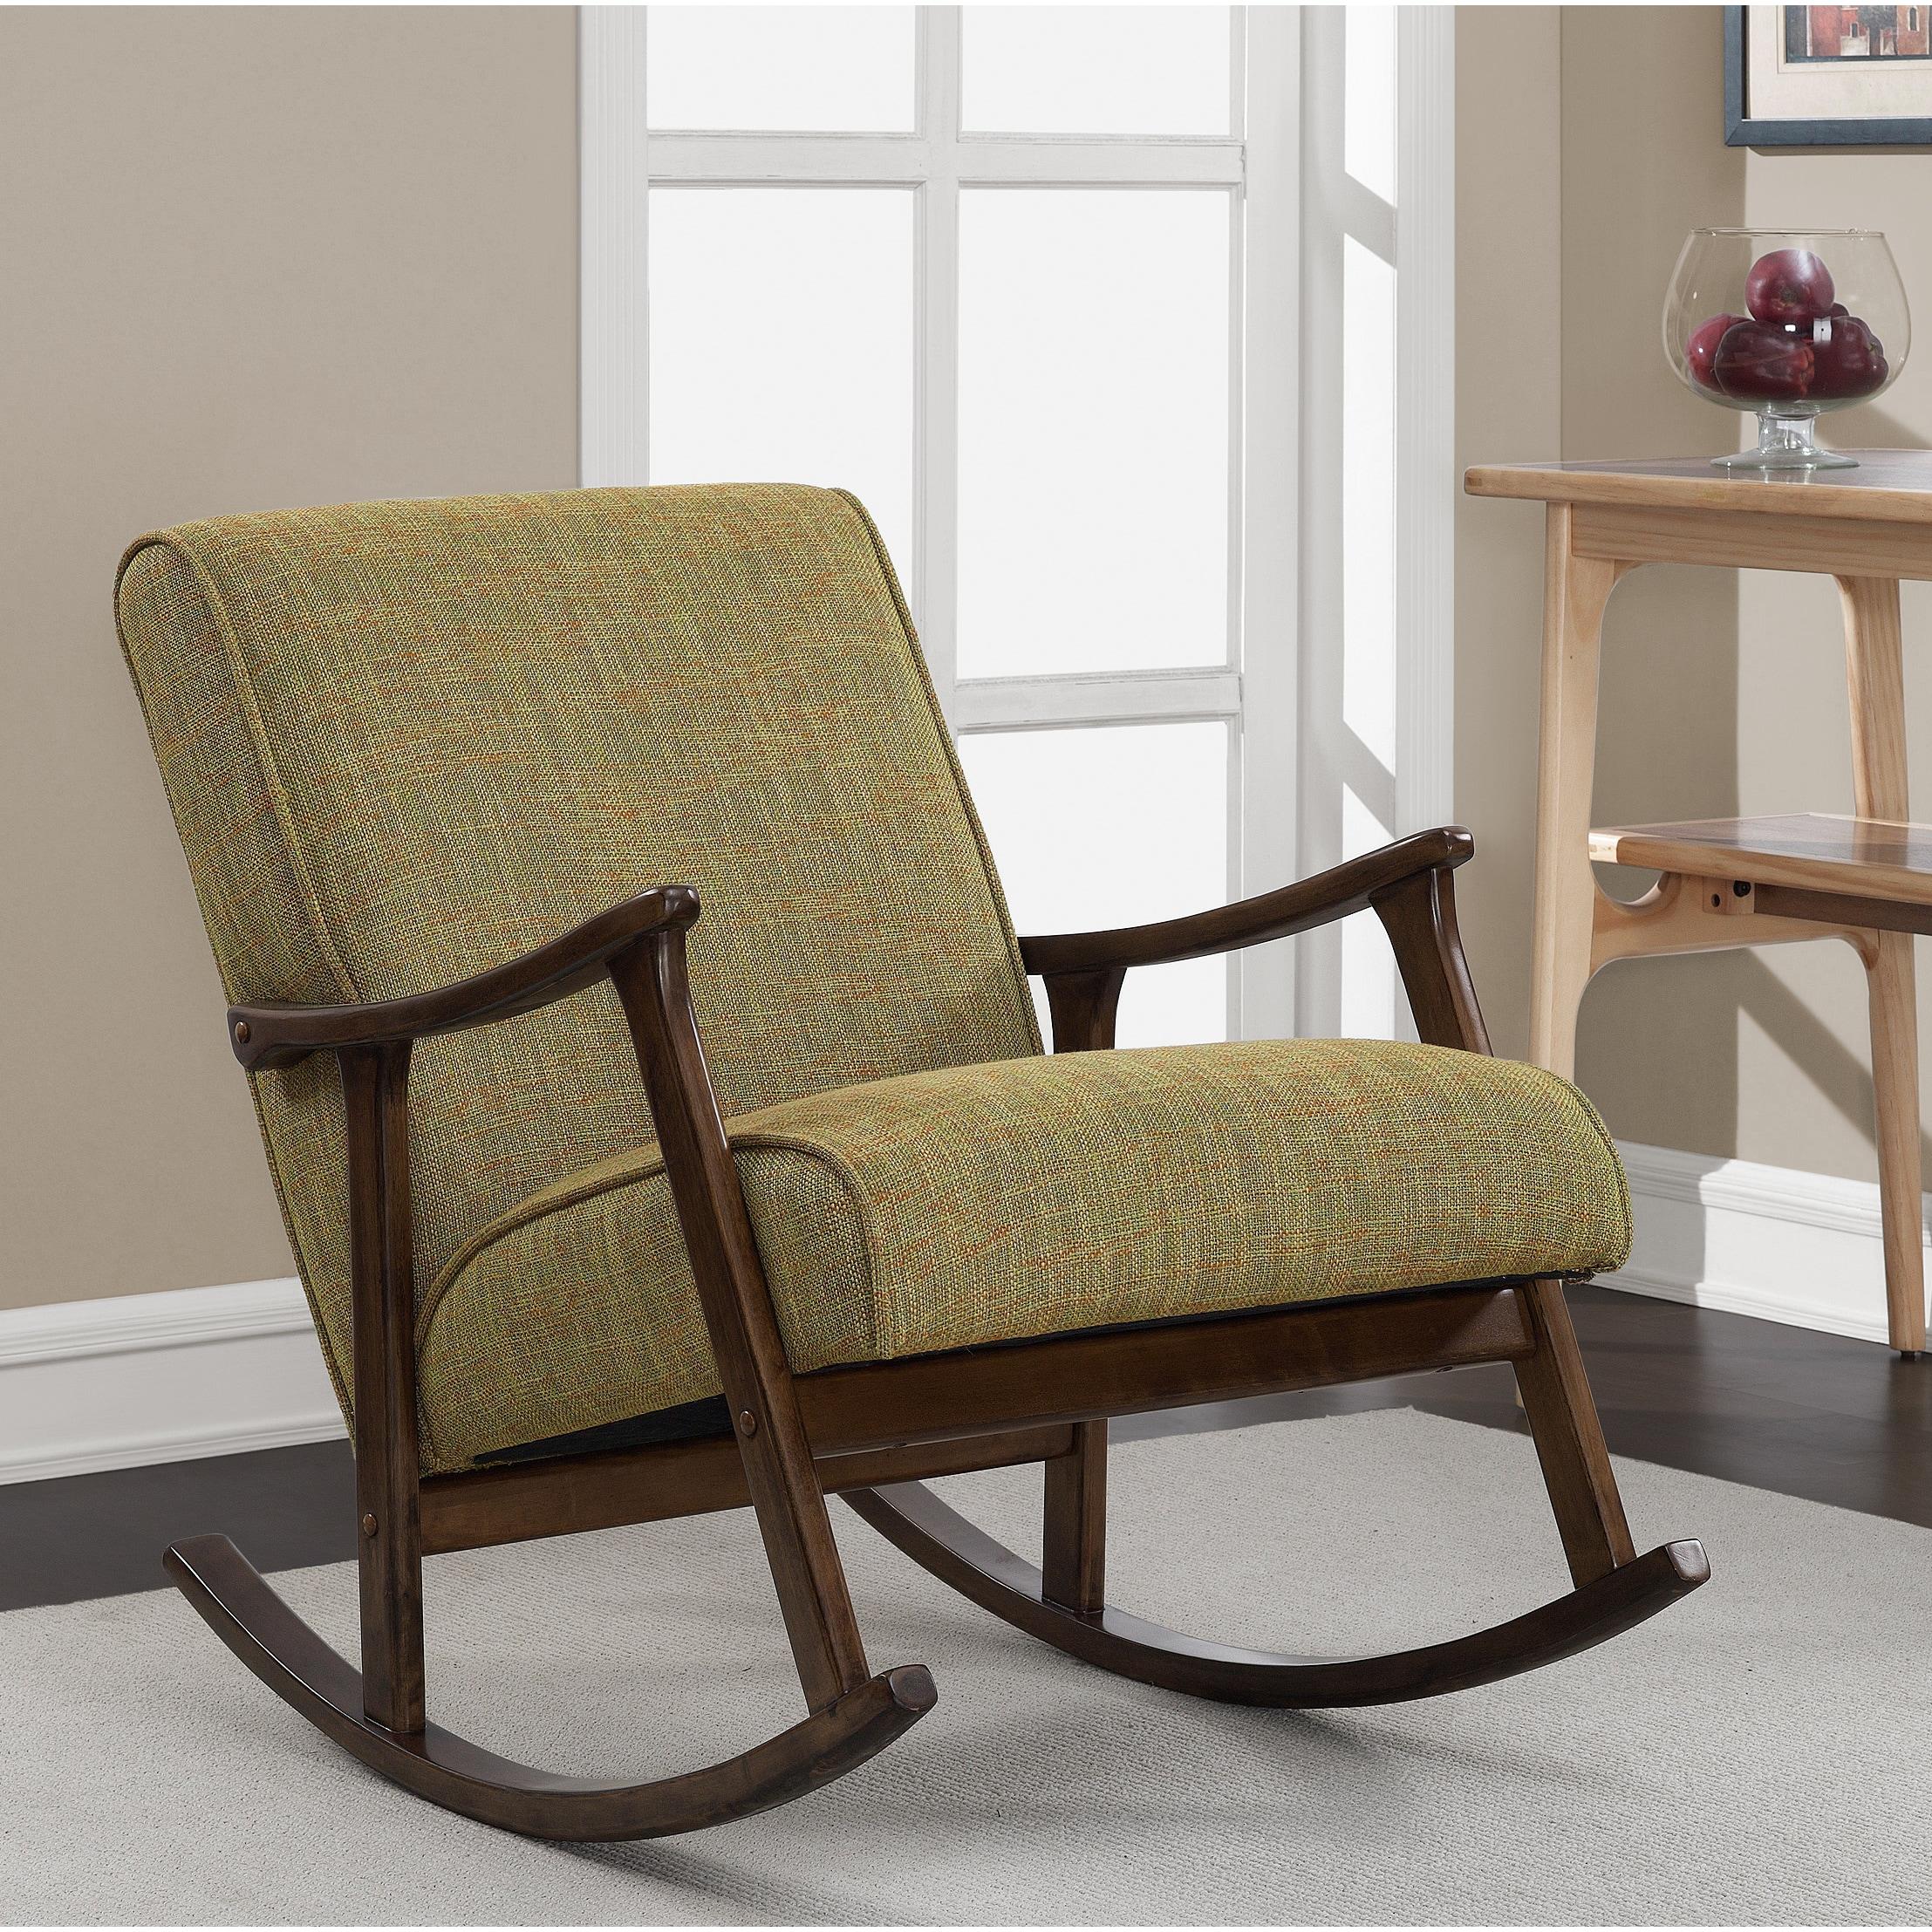 Mid Century Green Wooden Rocking Chair (Retro Wooden Rock...